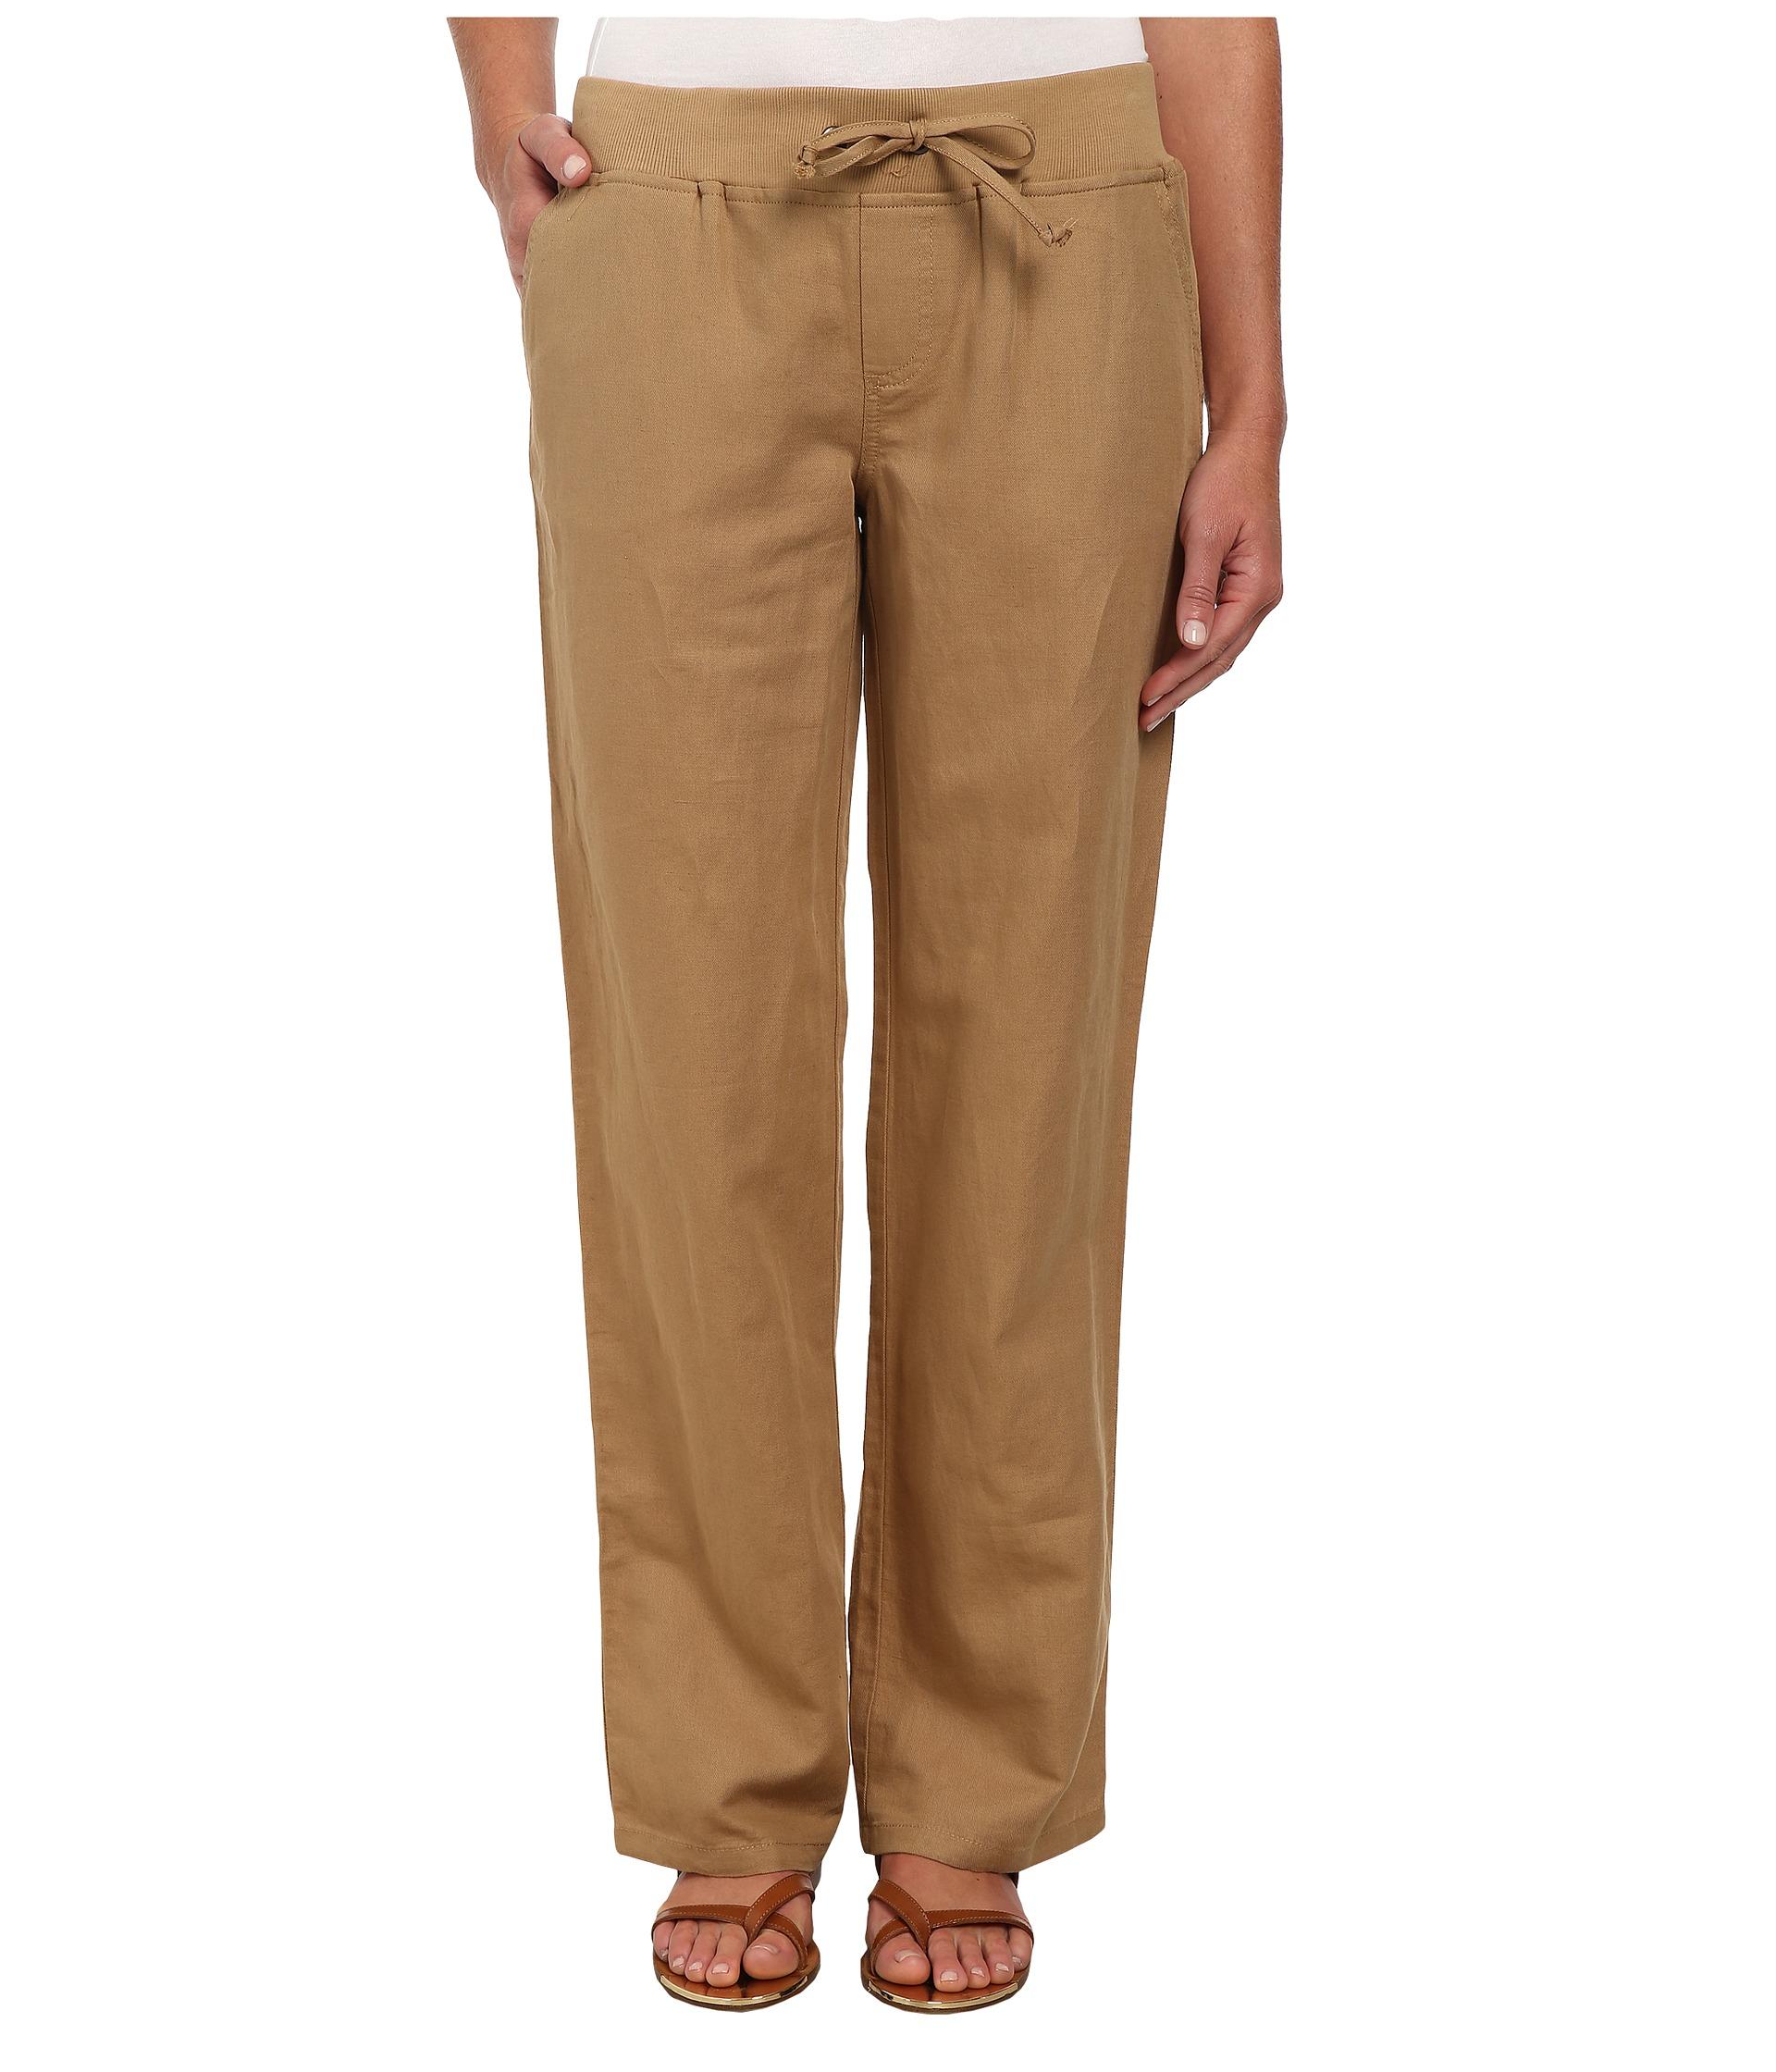 Mens Grey Drawstring Linen Pants | Images Guru